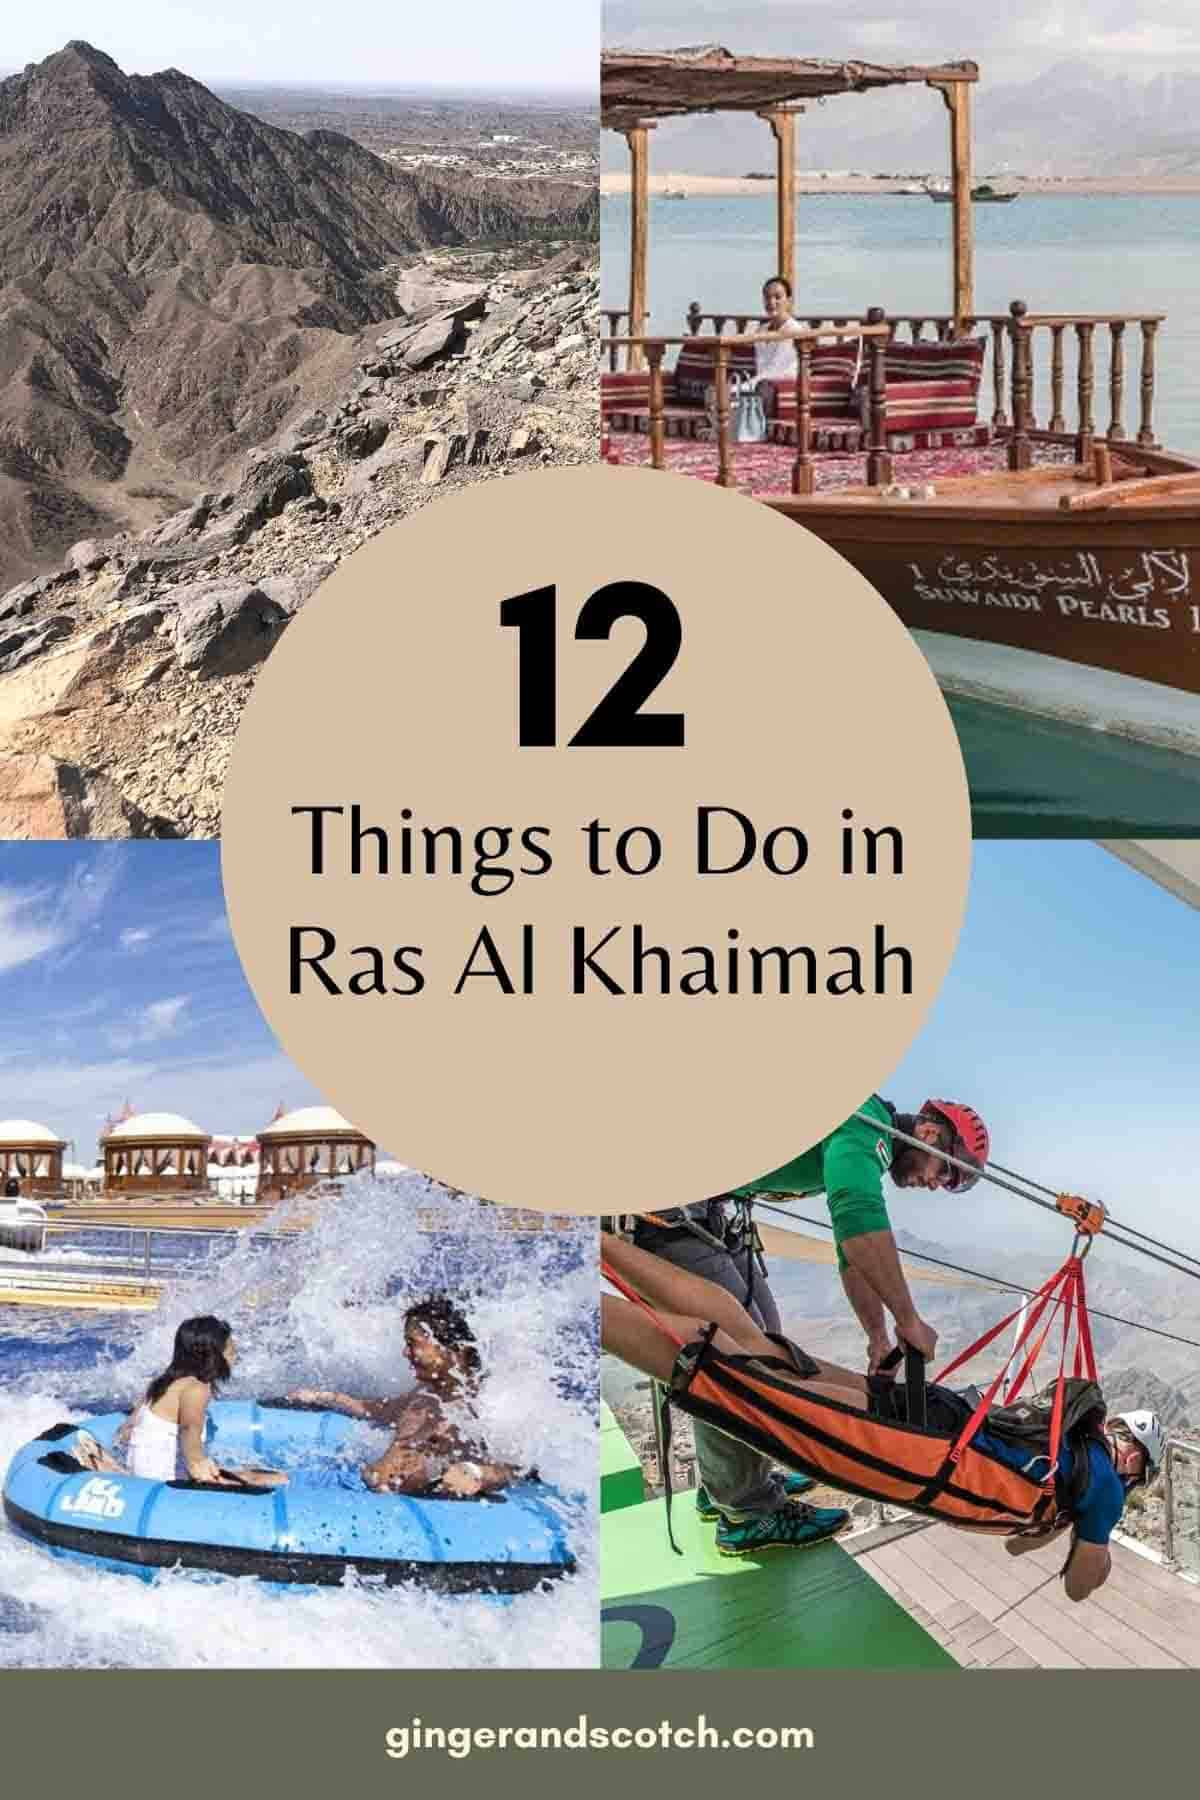 12 Things to Do in Ras Al Khaimah